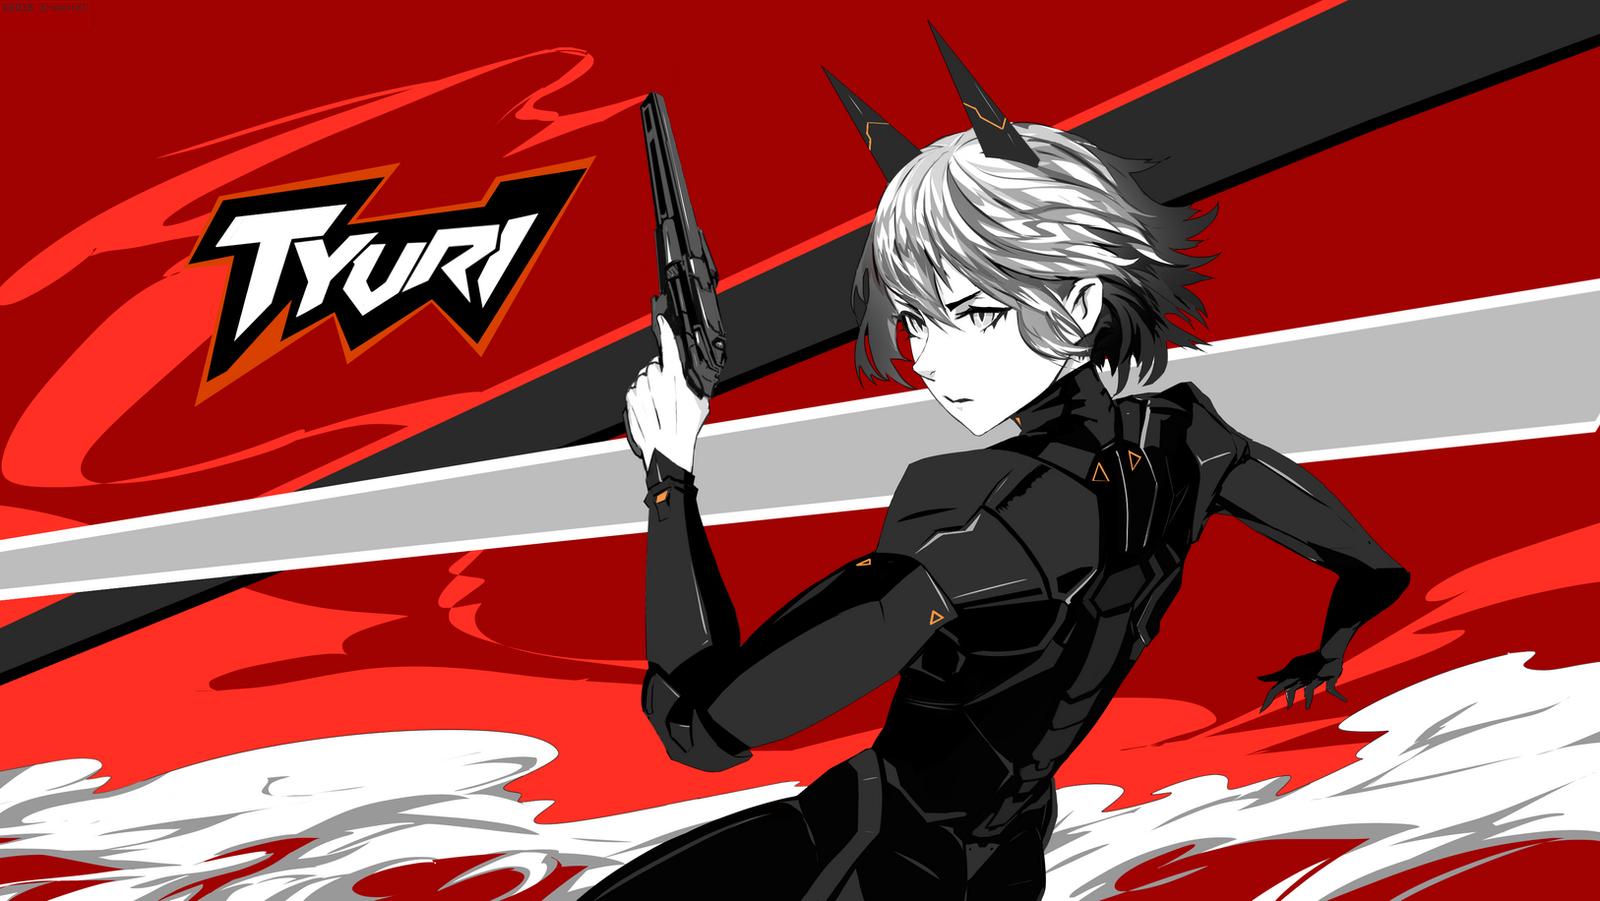 Tyuri Persona 5 style by arsenixc